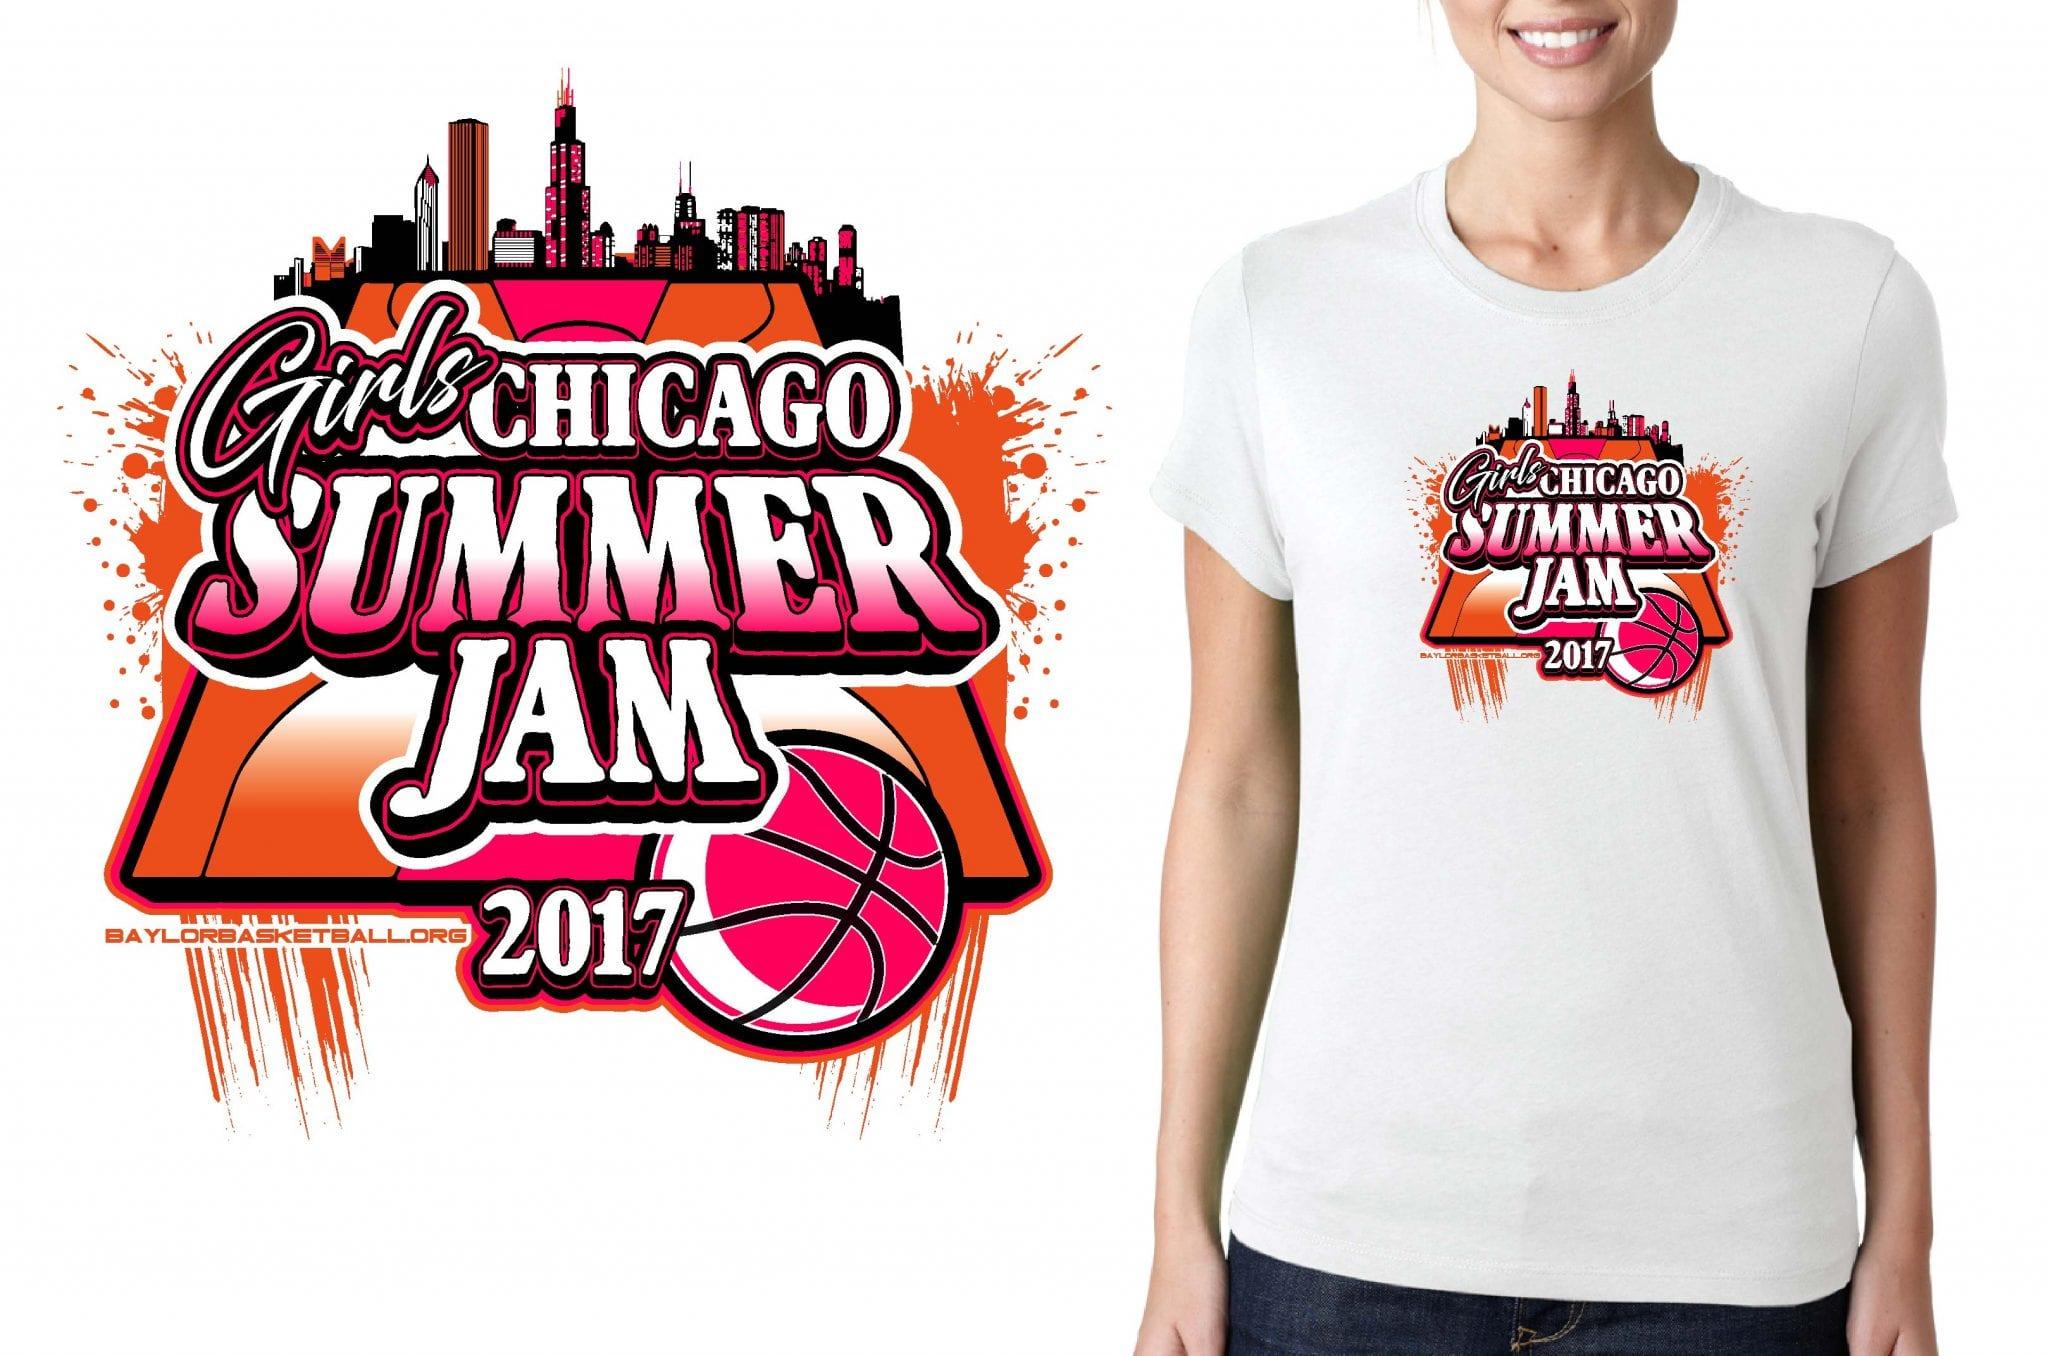 BASKETBALL TSHIRT LOGO DESIGN Girls-Chicago-Summer-Jam BY UrArtStudio